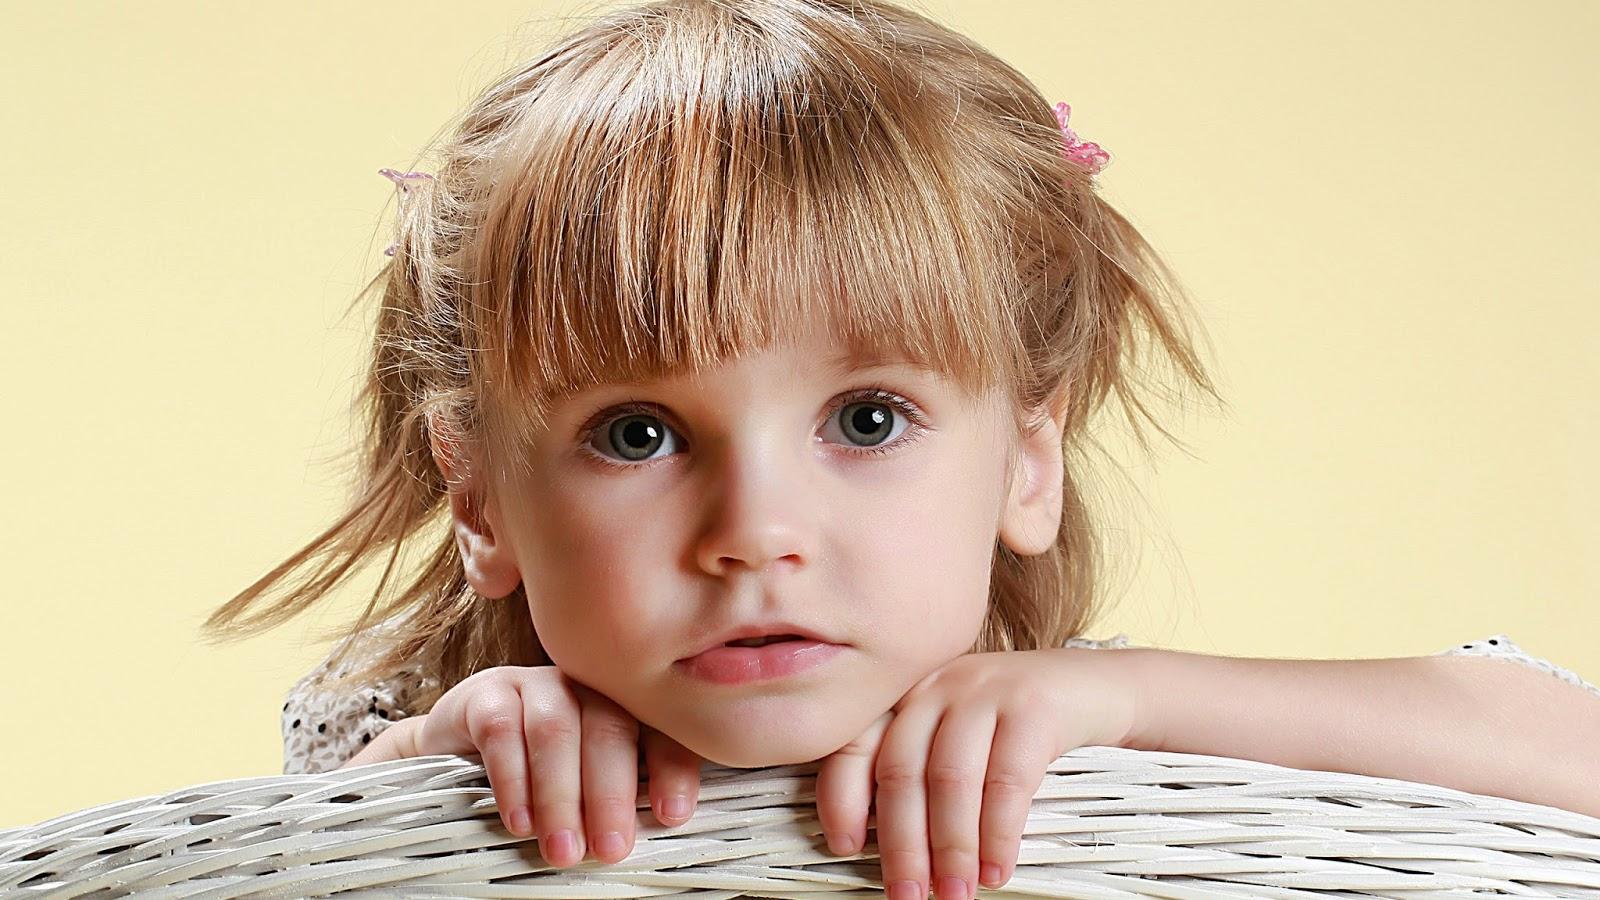 Windows 8 HD Wallpapers: Cute Kids Wallpapers Episode 4